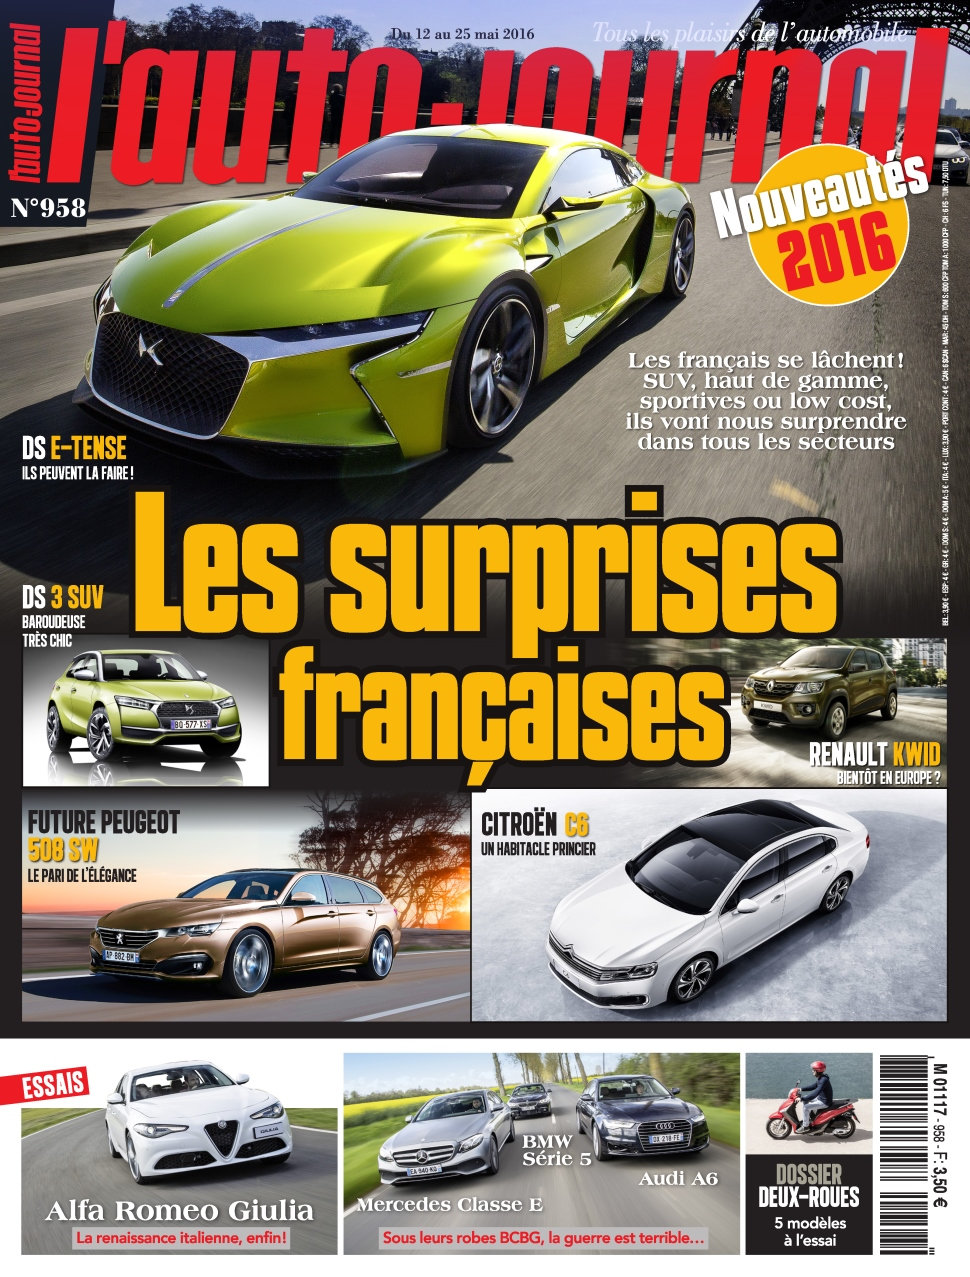 L'Auto-Journal N°958 - 12 au 25 Mai 2016